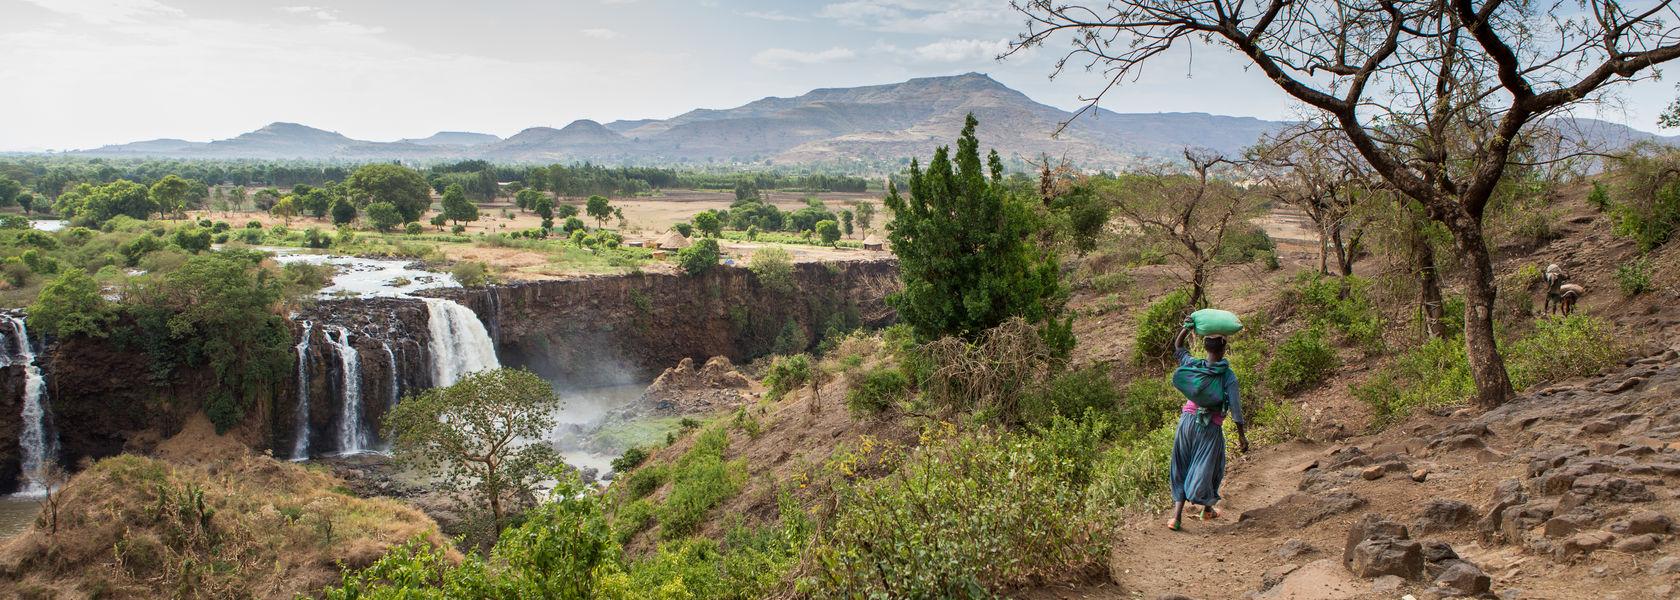 Bahir Dar en het Tanameer - Ethiopië | Matoke Tours